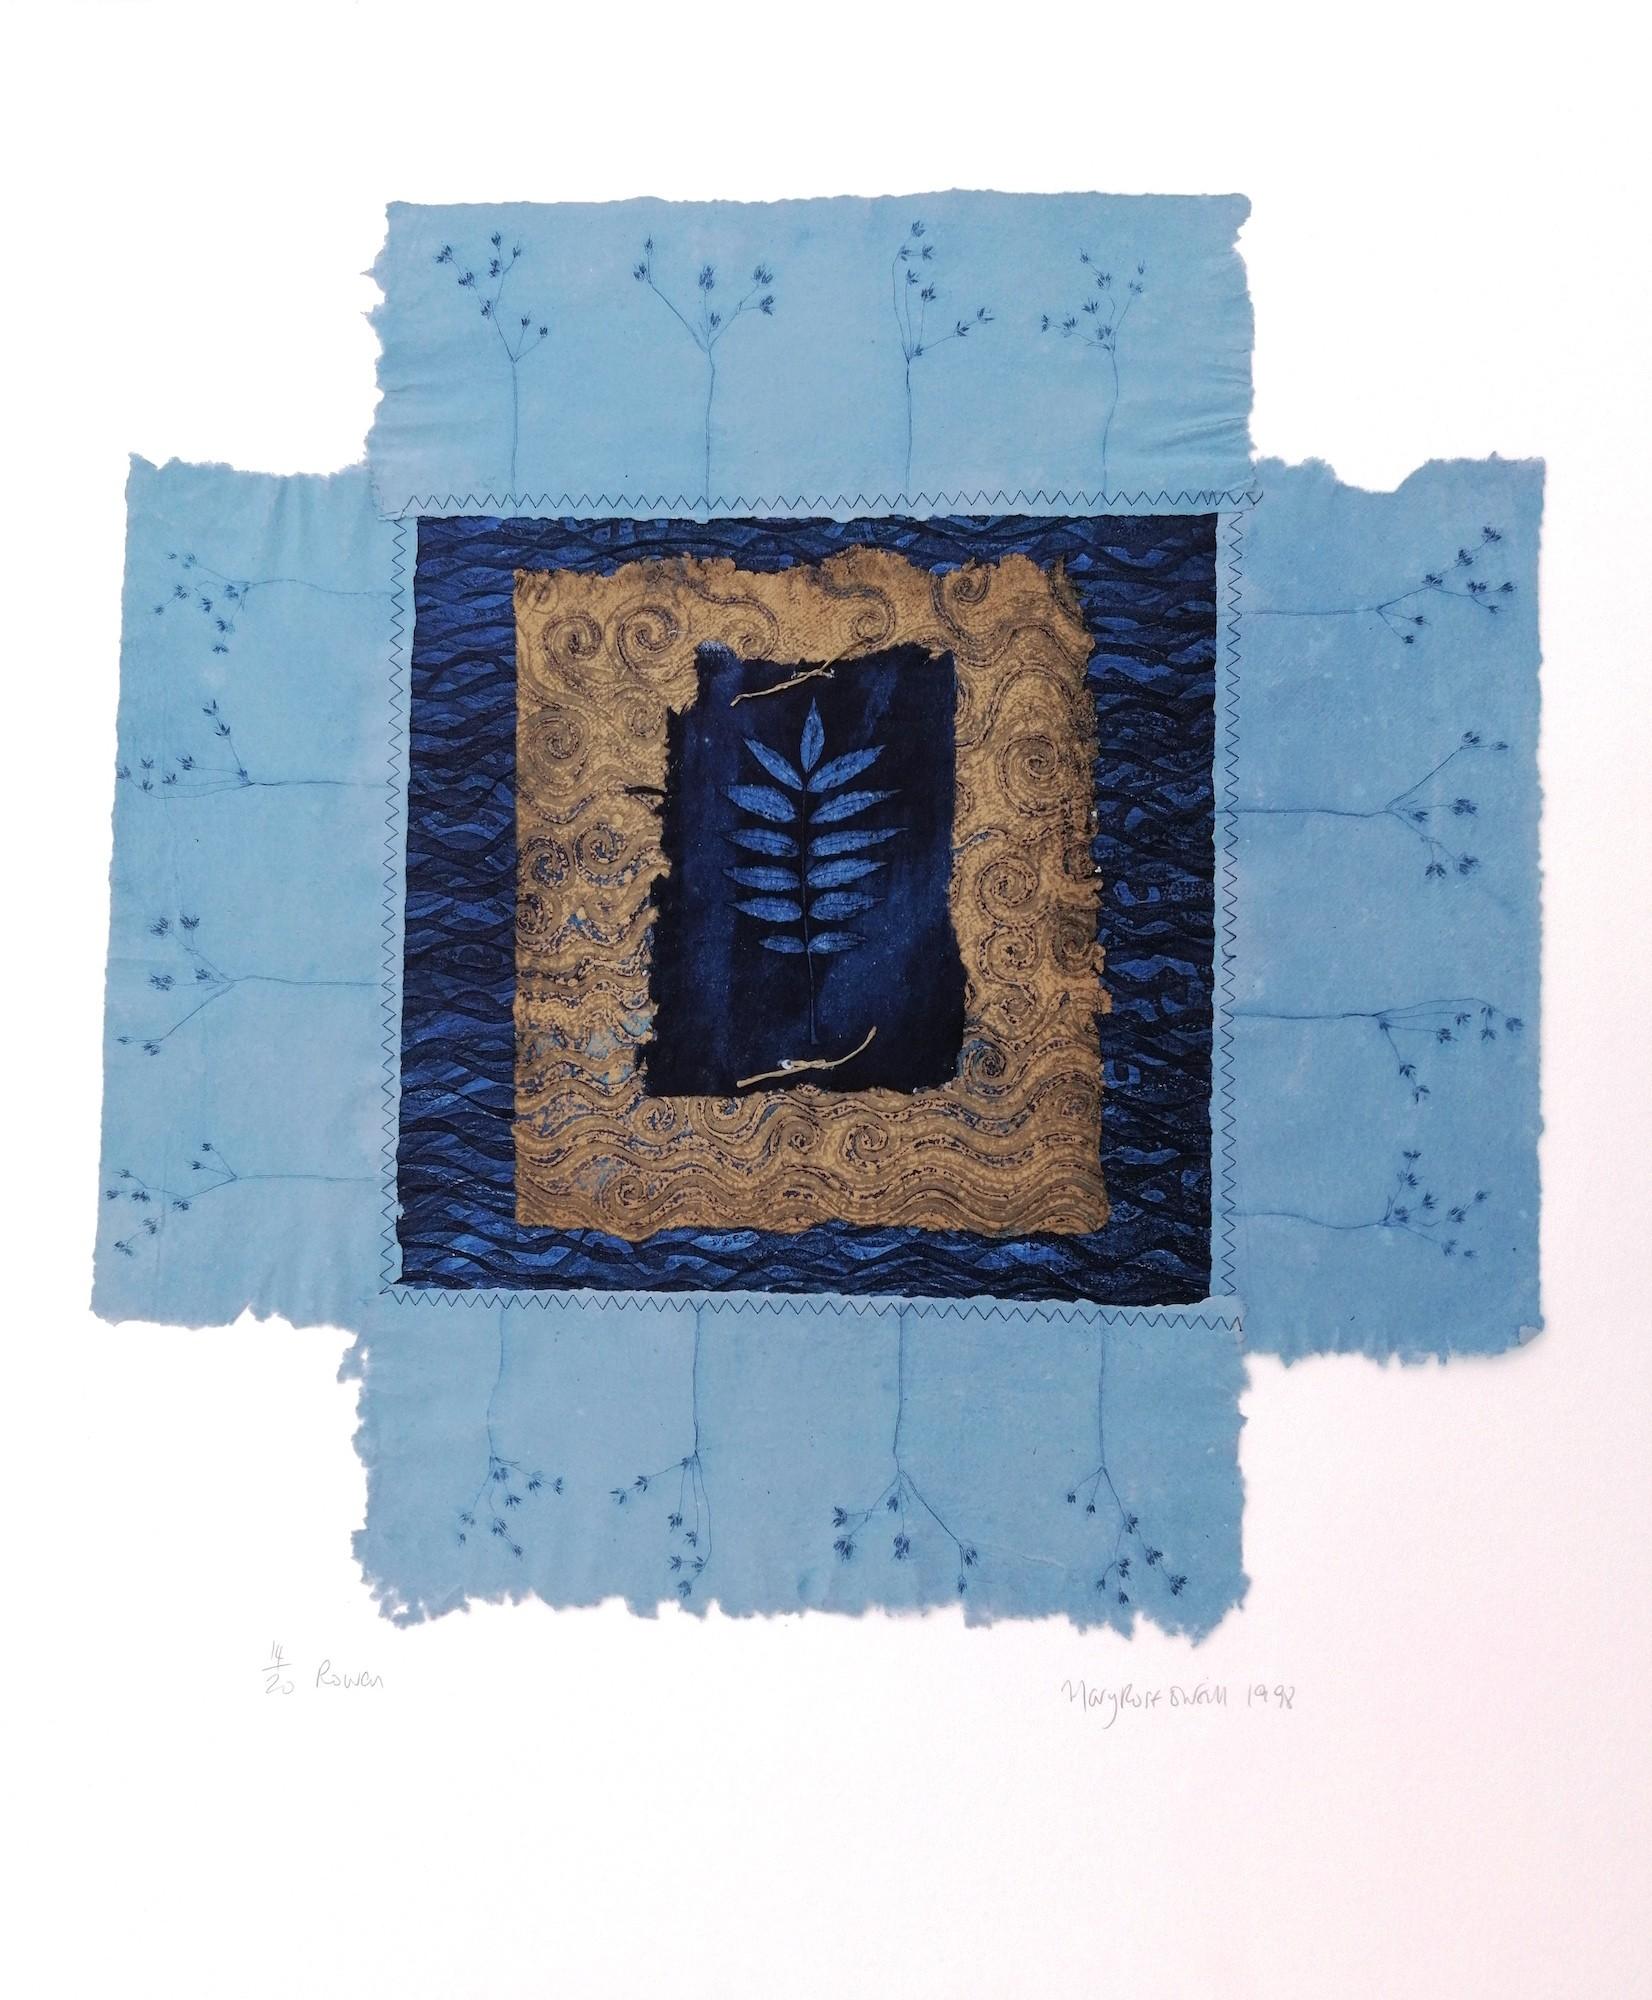 O'neill, Mary Rose, Kunst, Galerie Voigt, Nürnberg